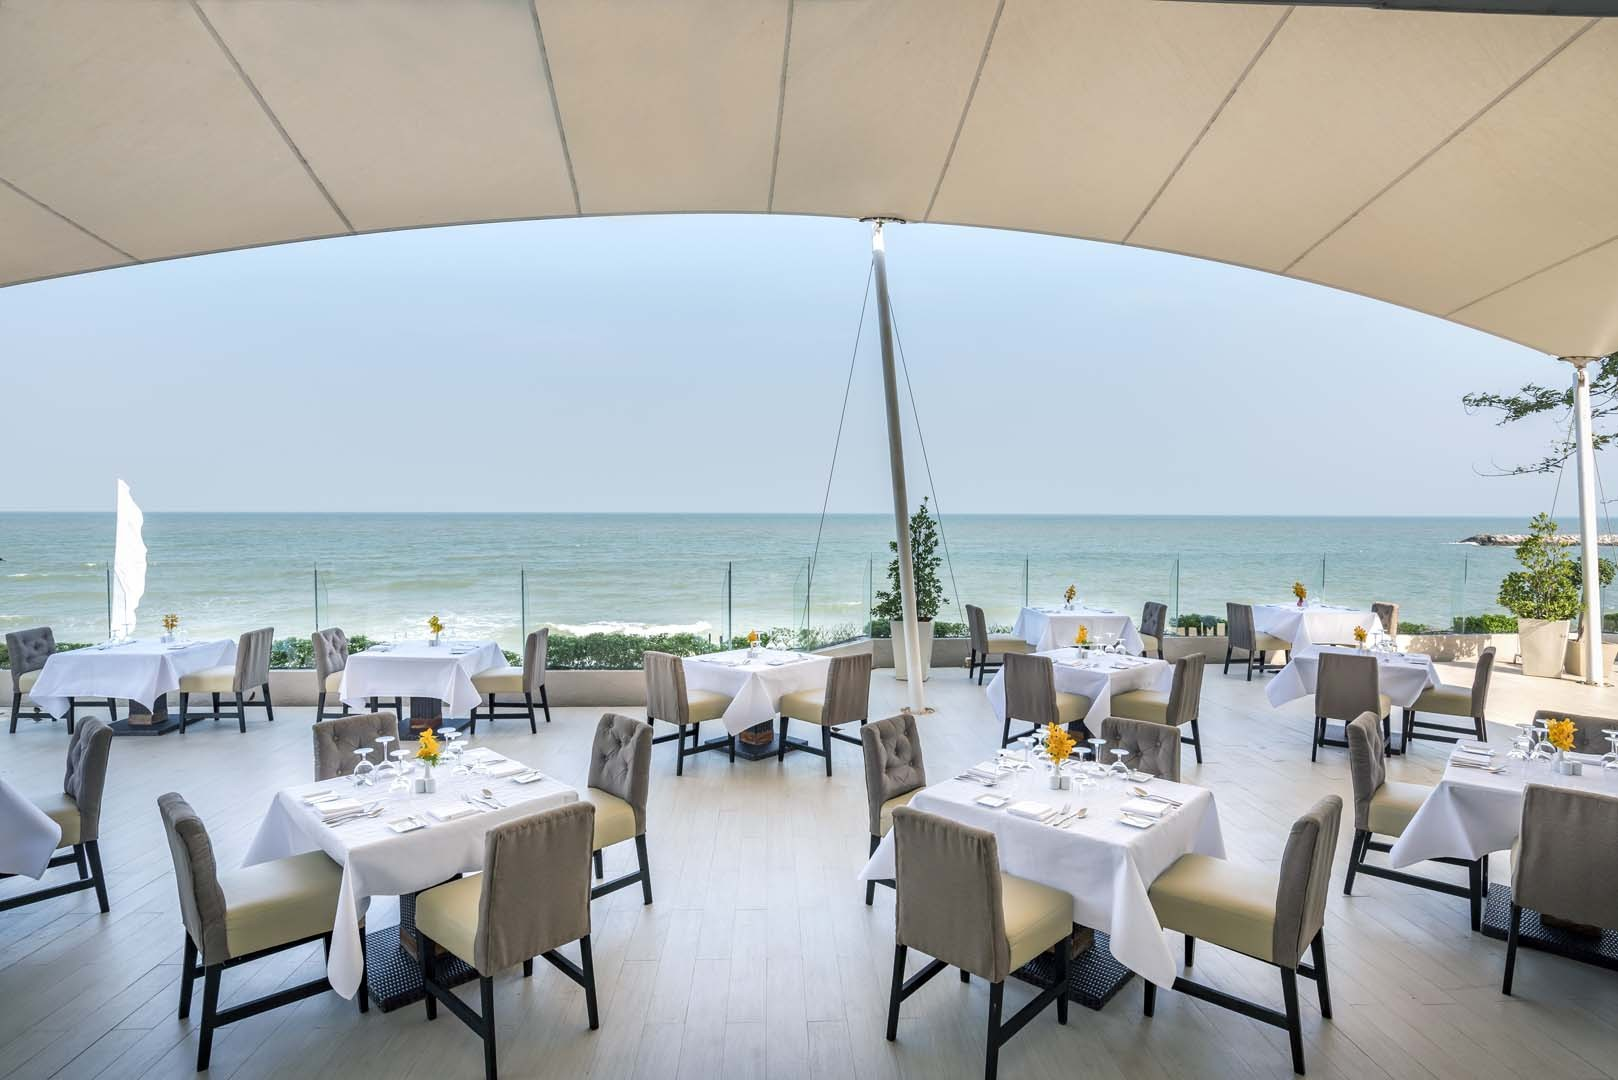 oceans-italian-seafood-restaurant